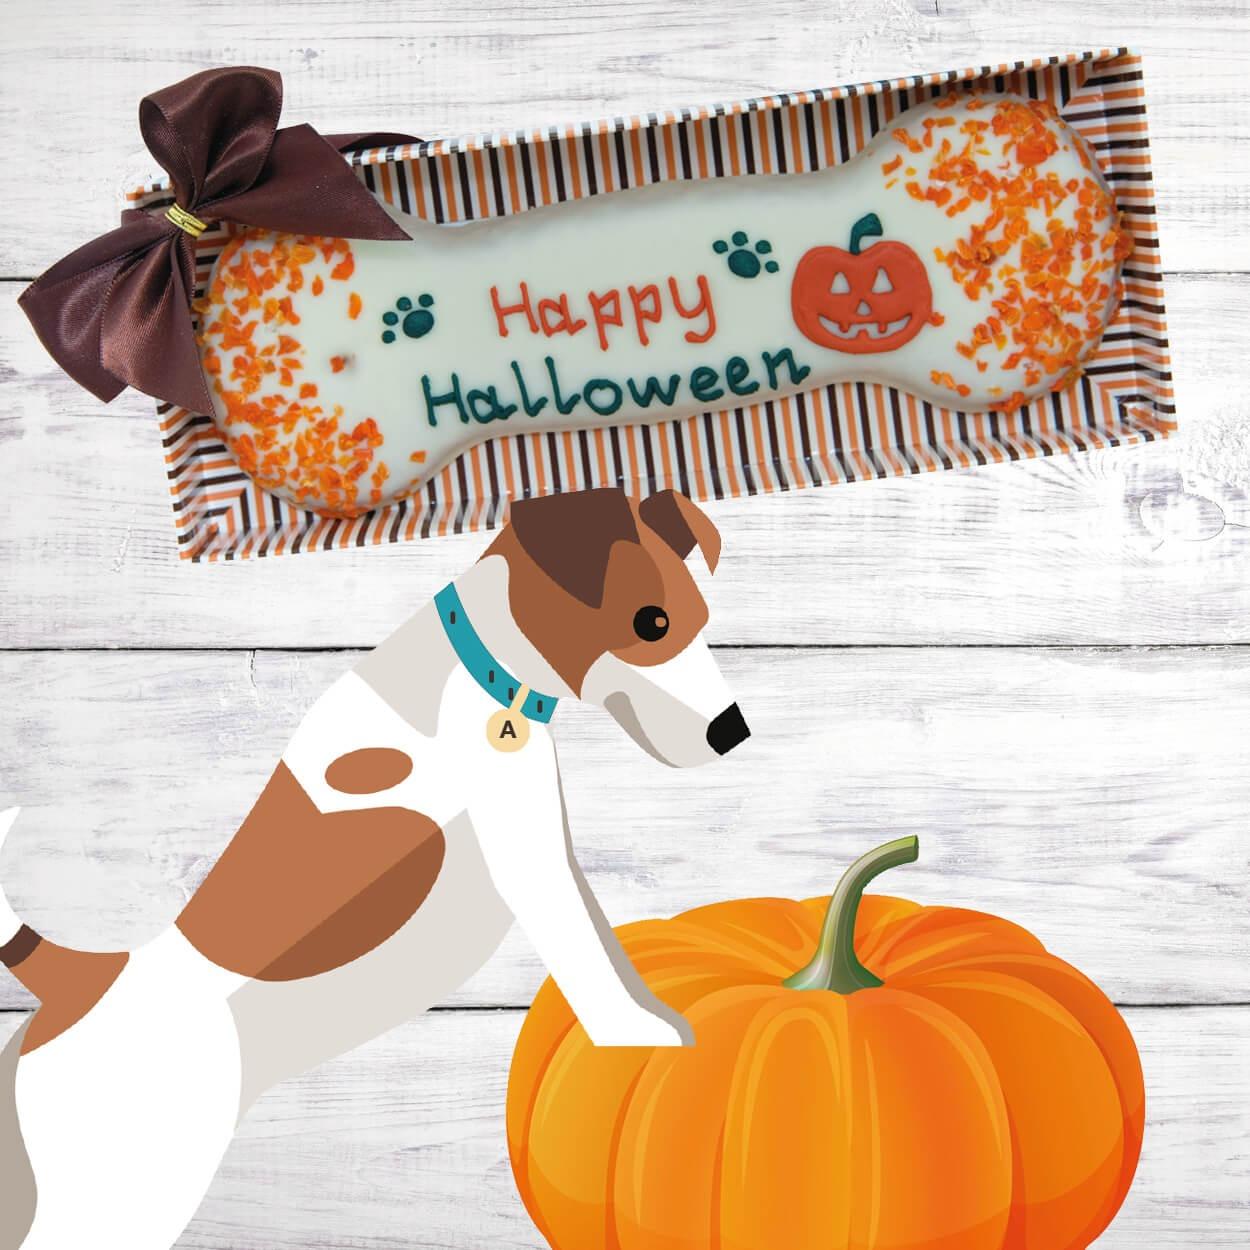 Halloween Biscuit Bone Image   Laughing Dog Food